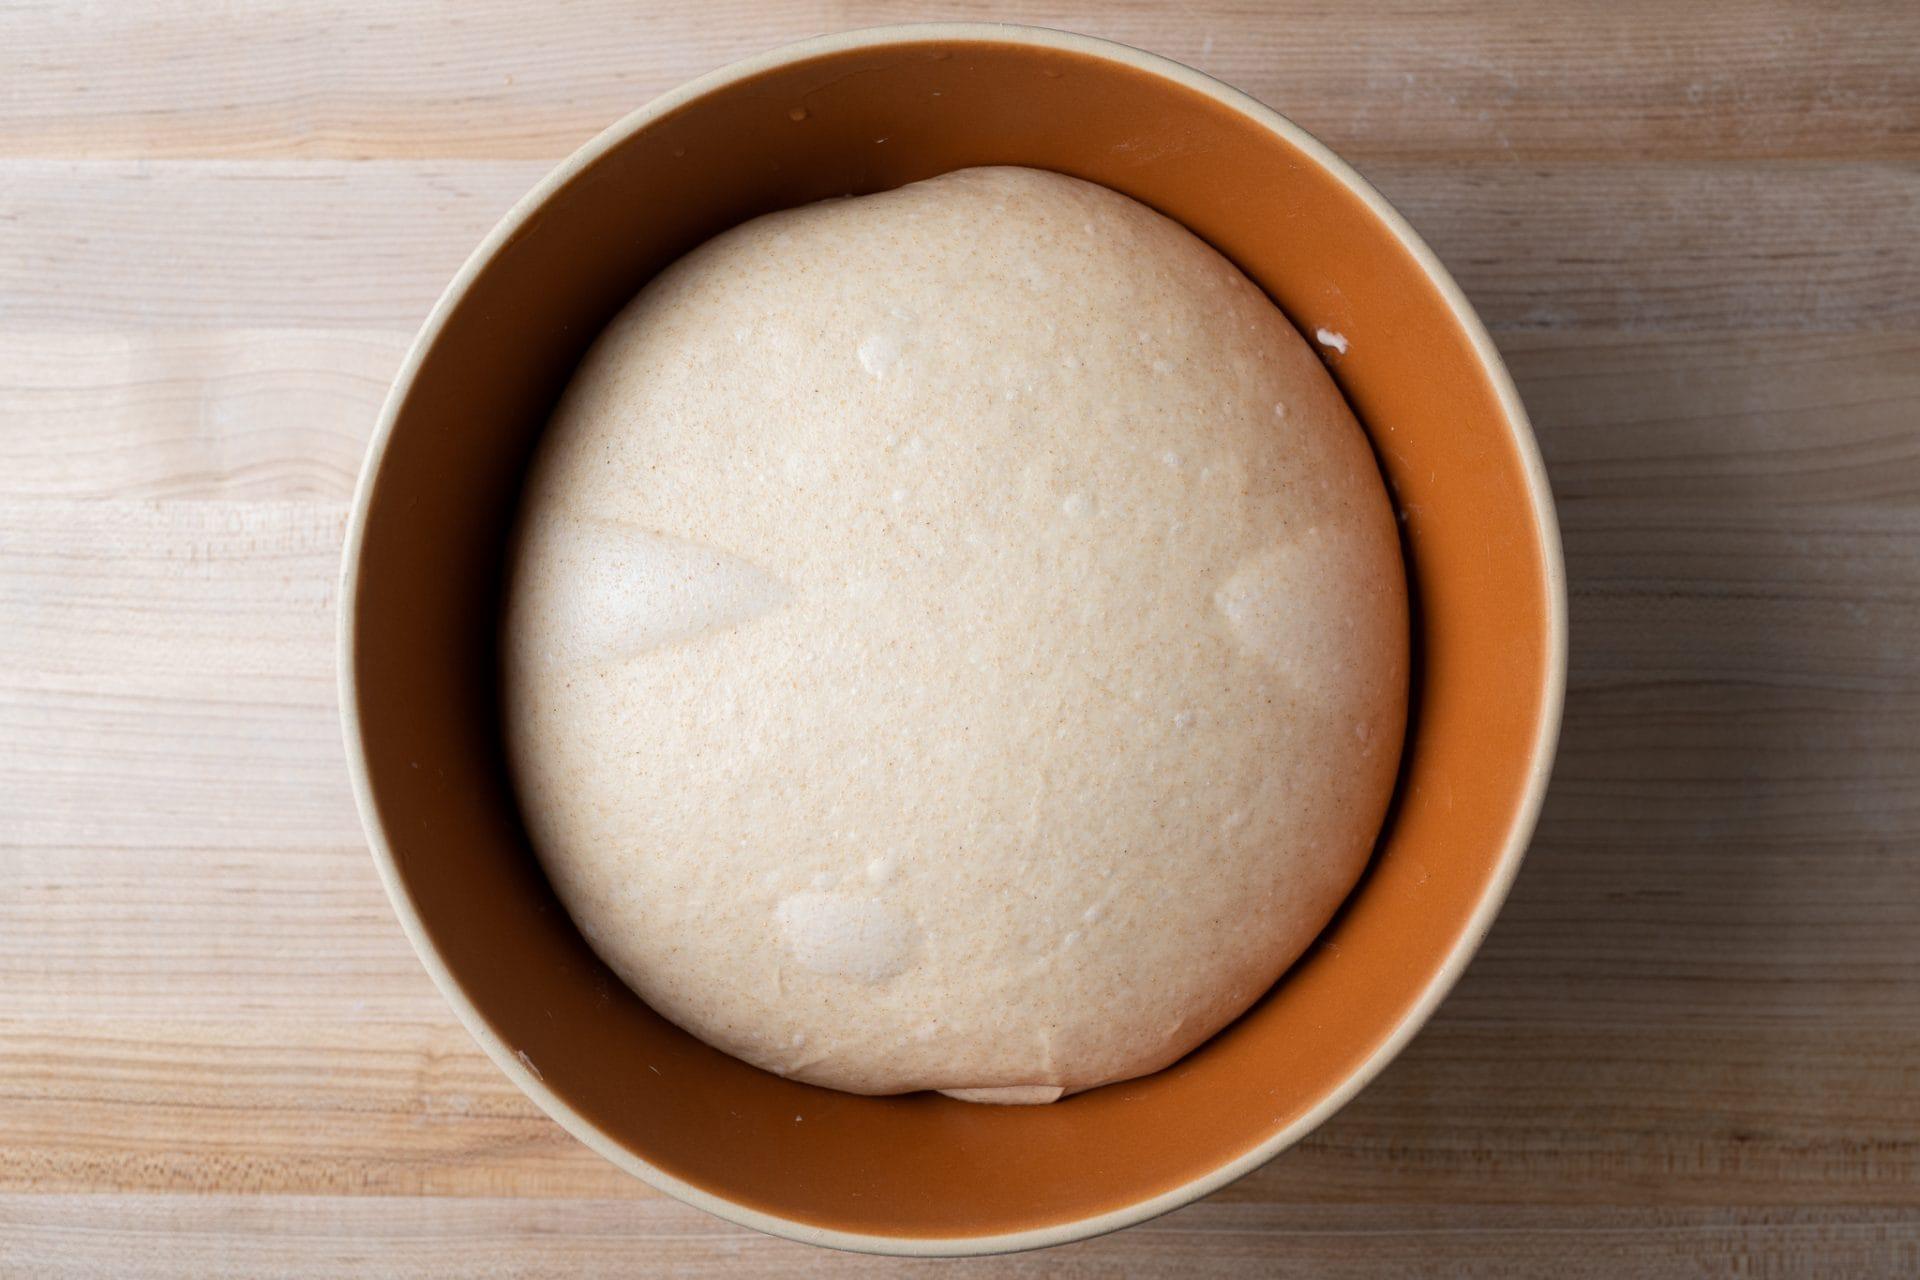 Hot dog bun dough after chilling